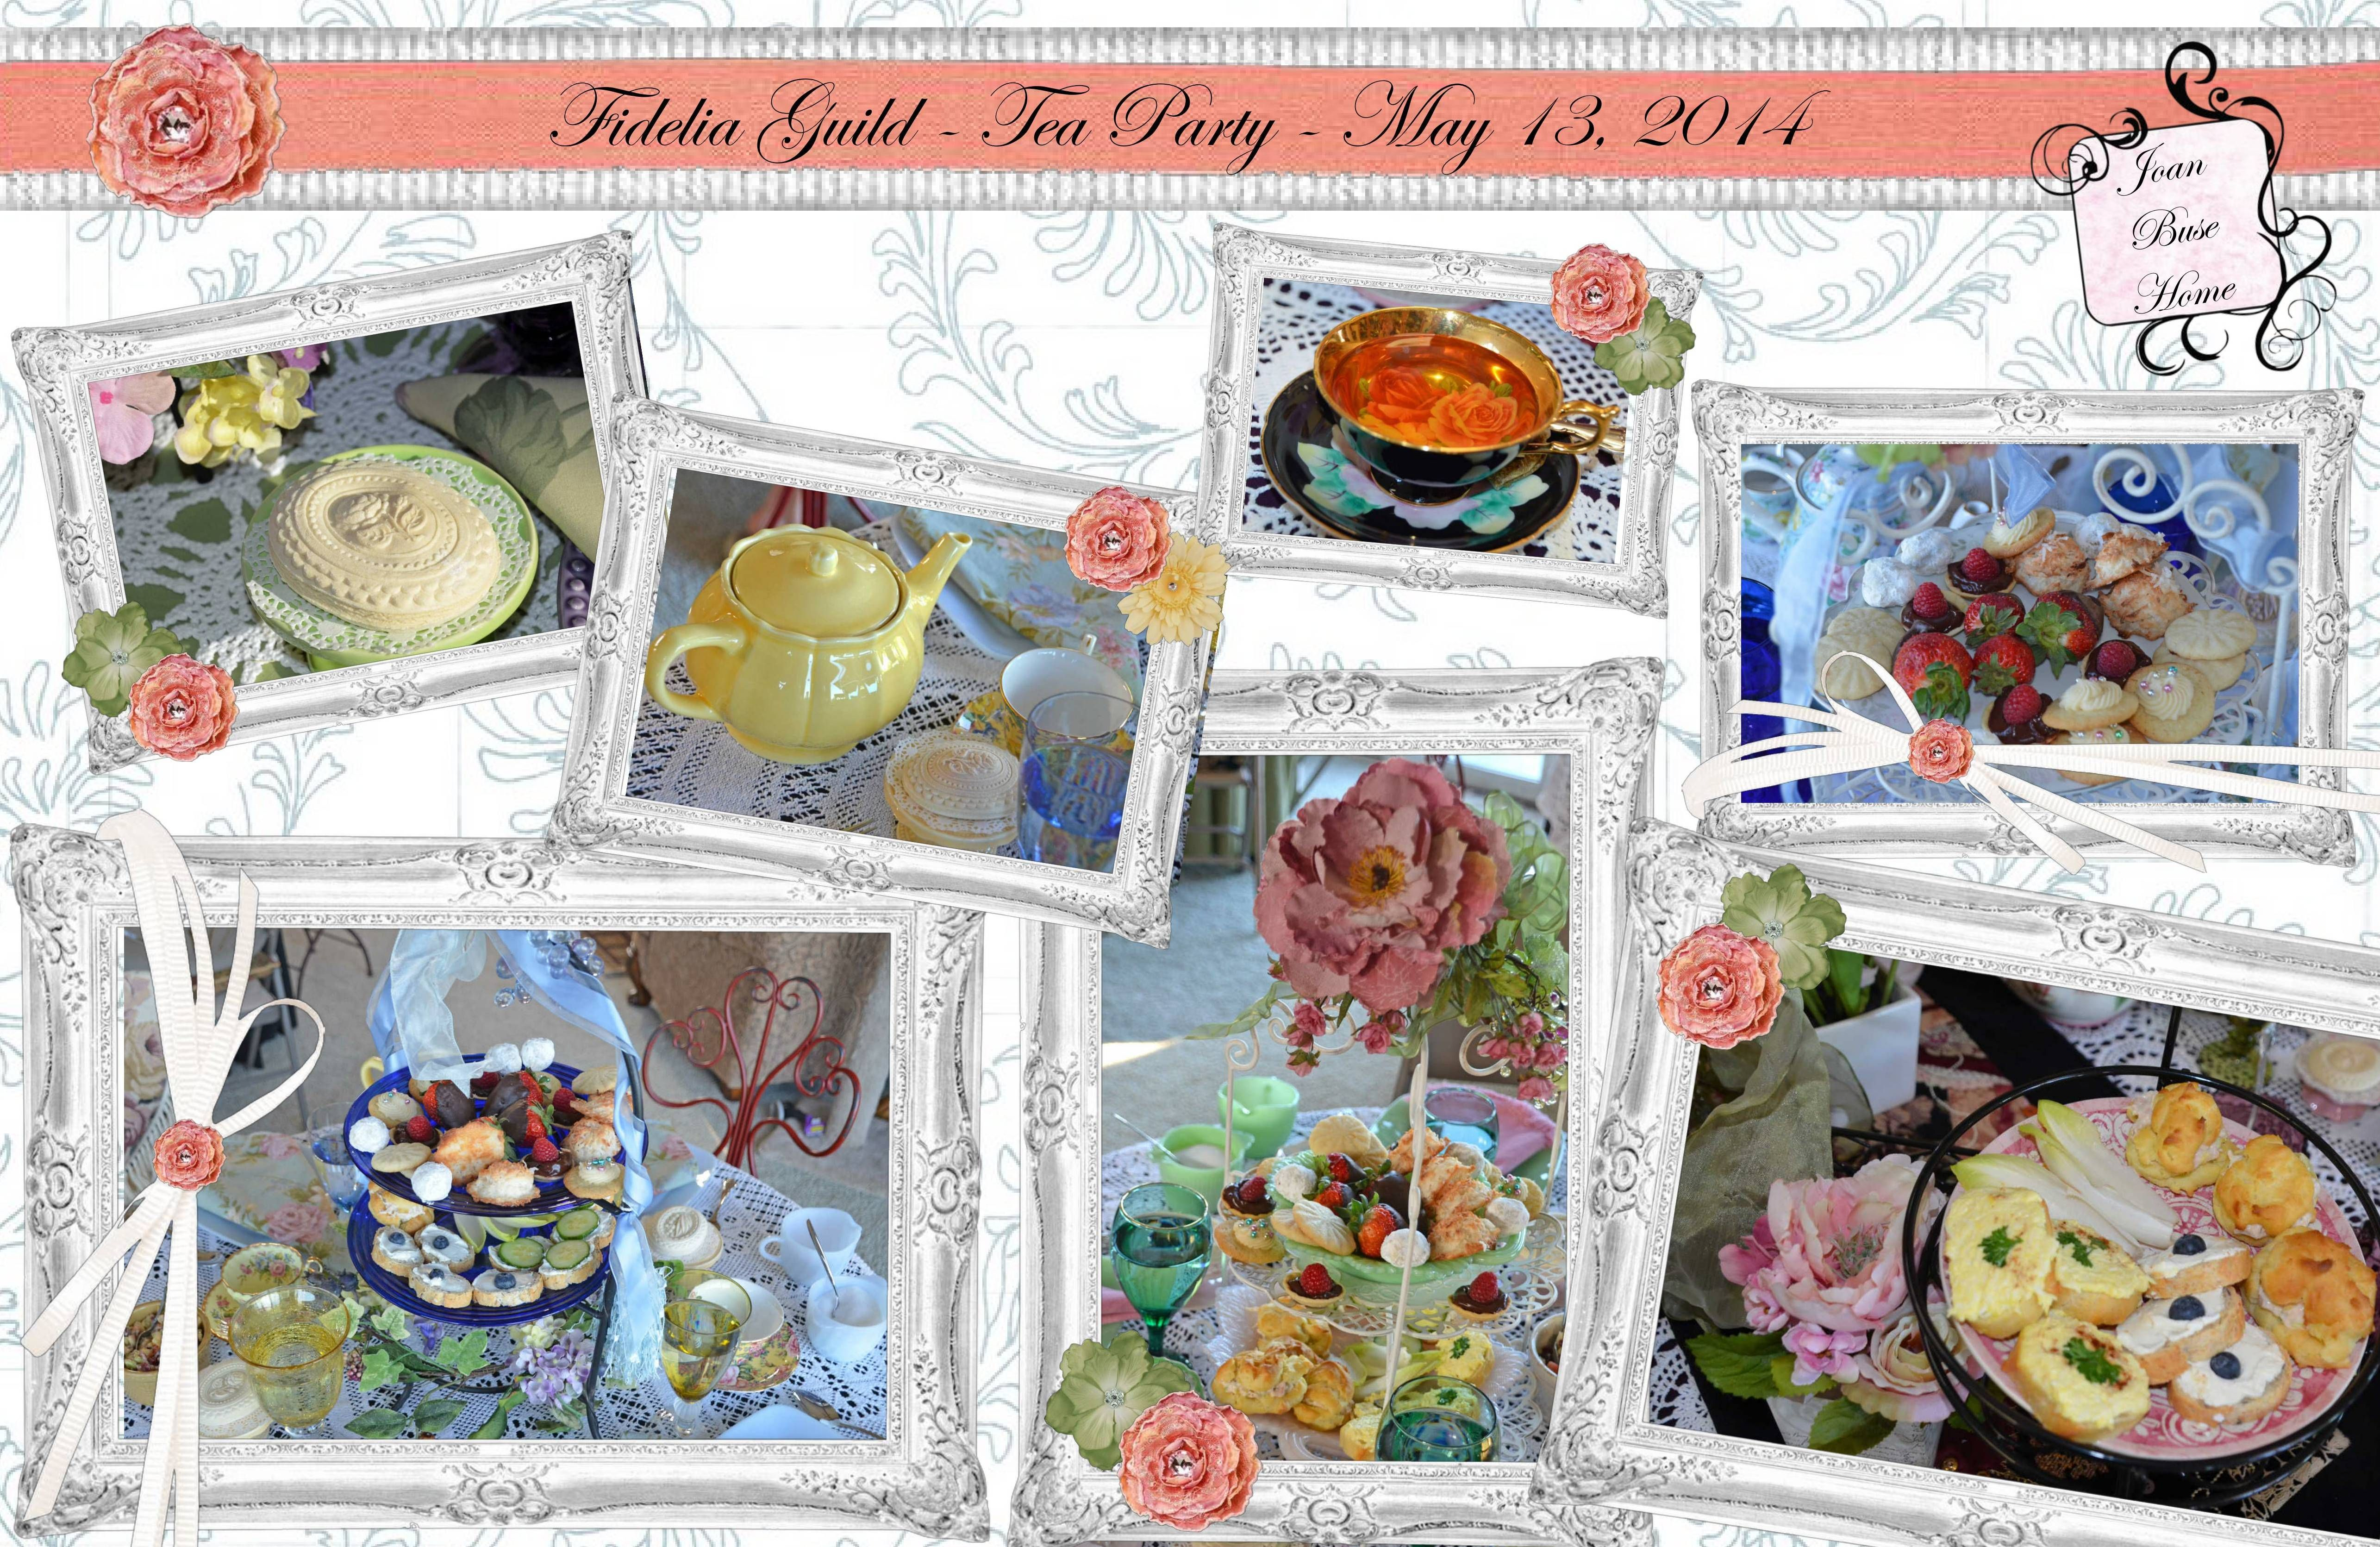 Poster design your own - Fidelia Guild Tea Party 2014 Poster Design Your Own Poster Canvas Print Photo